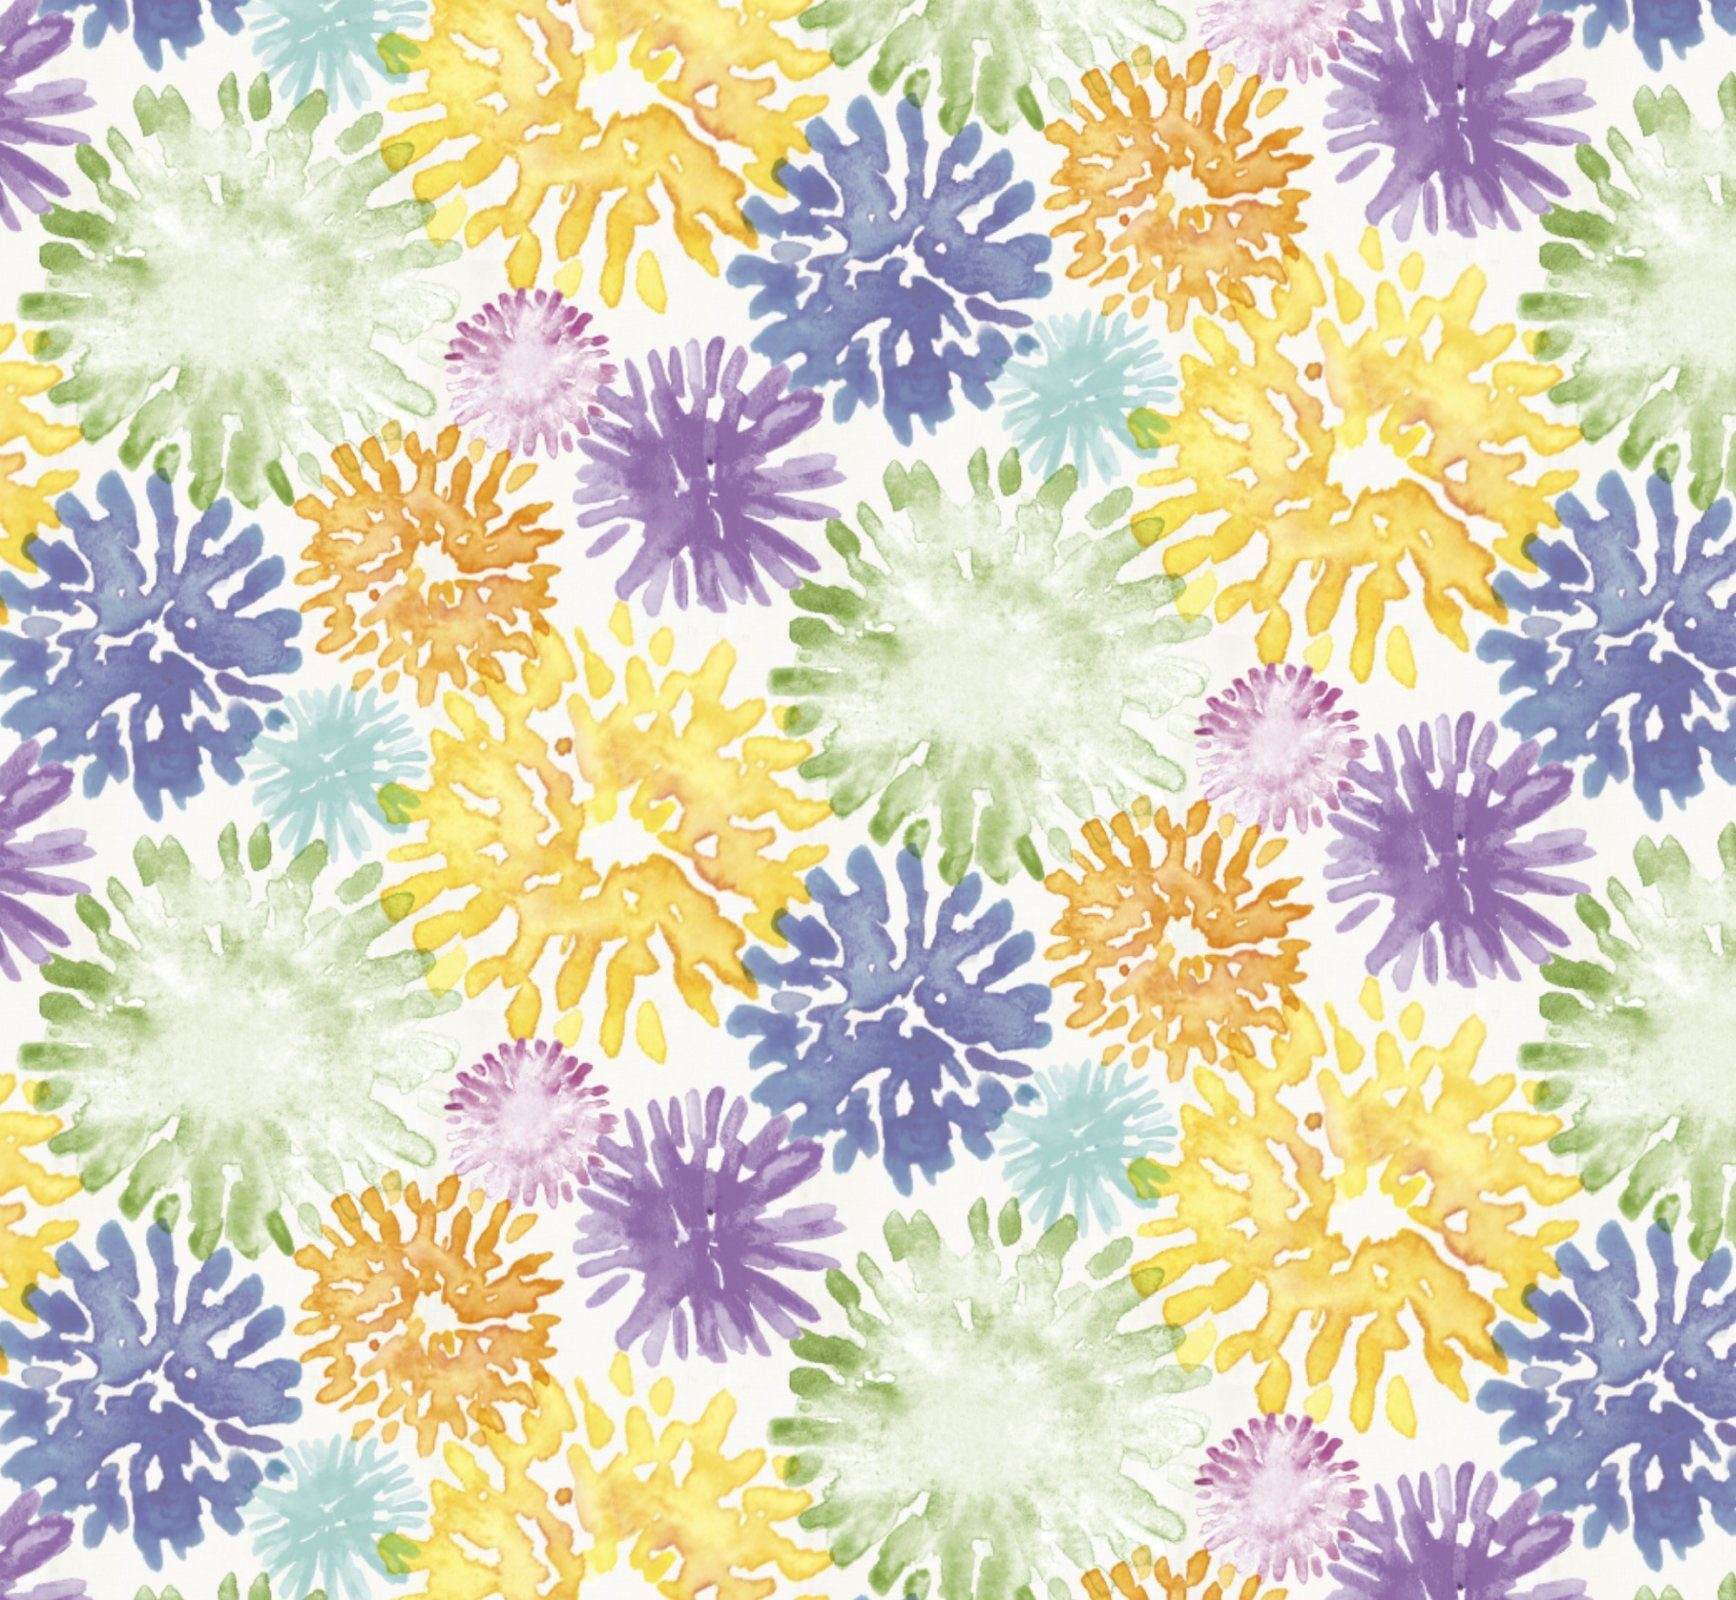 DT-Bee Harmony WA-5887-0C-1 White - Harmony Bloom